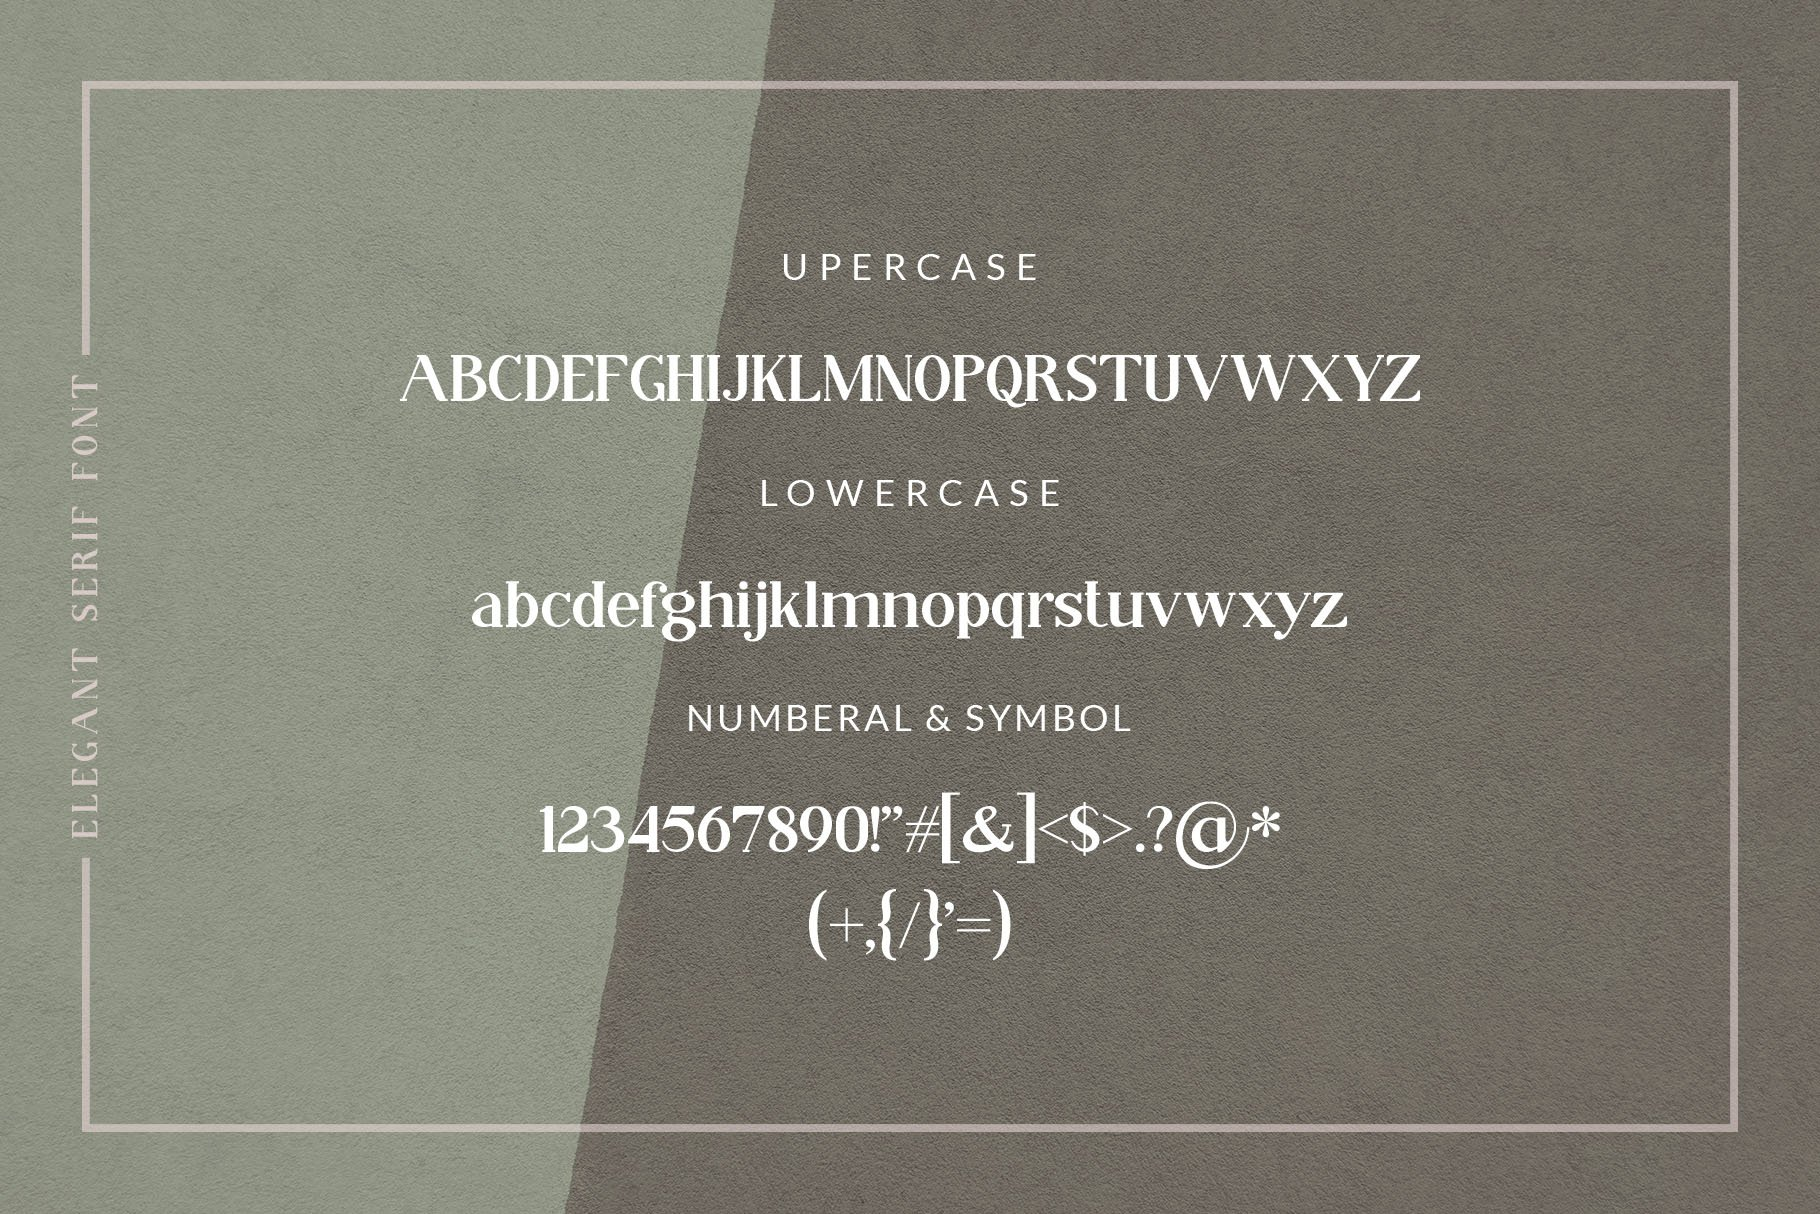 MORJUIS - Serif Font Typeface example image 7